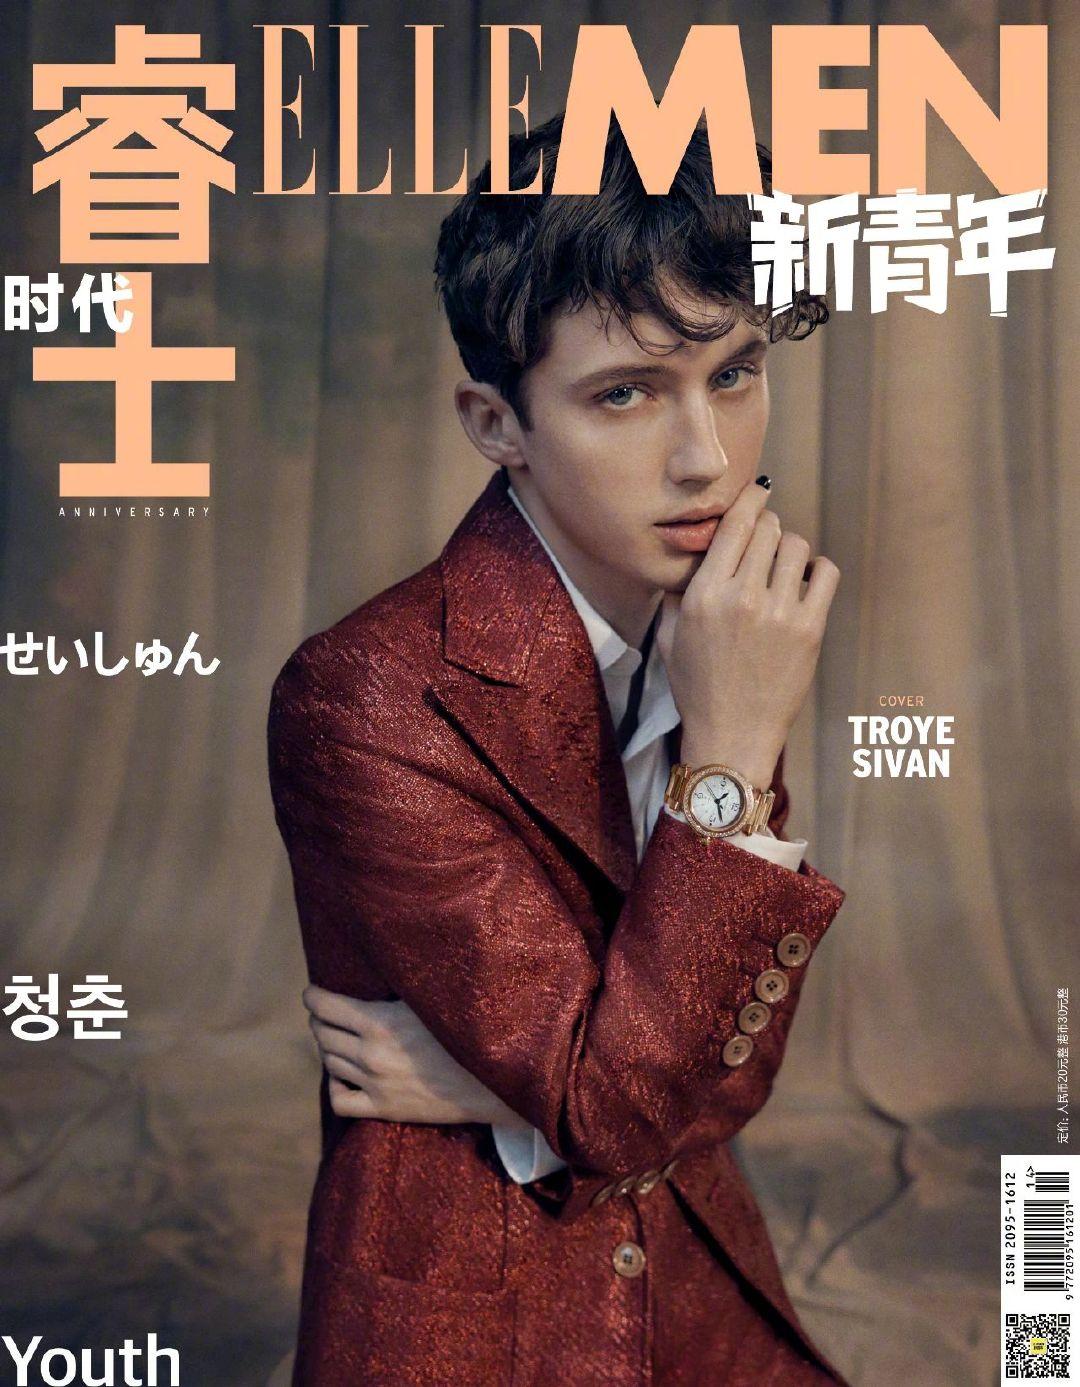 Troye Sivan身着Gucci红色暗纹西服套装和白色衬衣、佩戴Cartier腕表